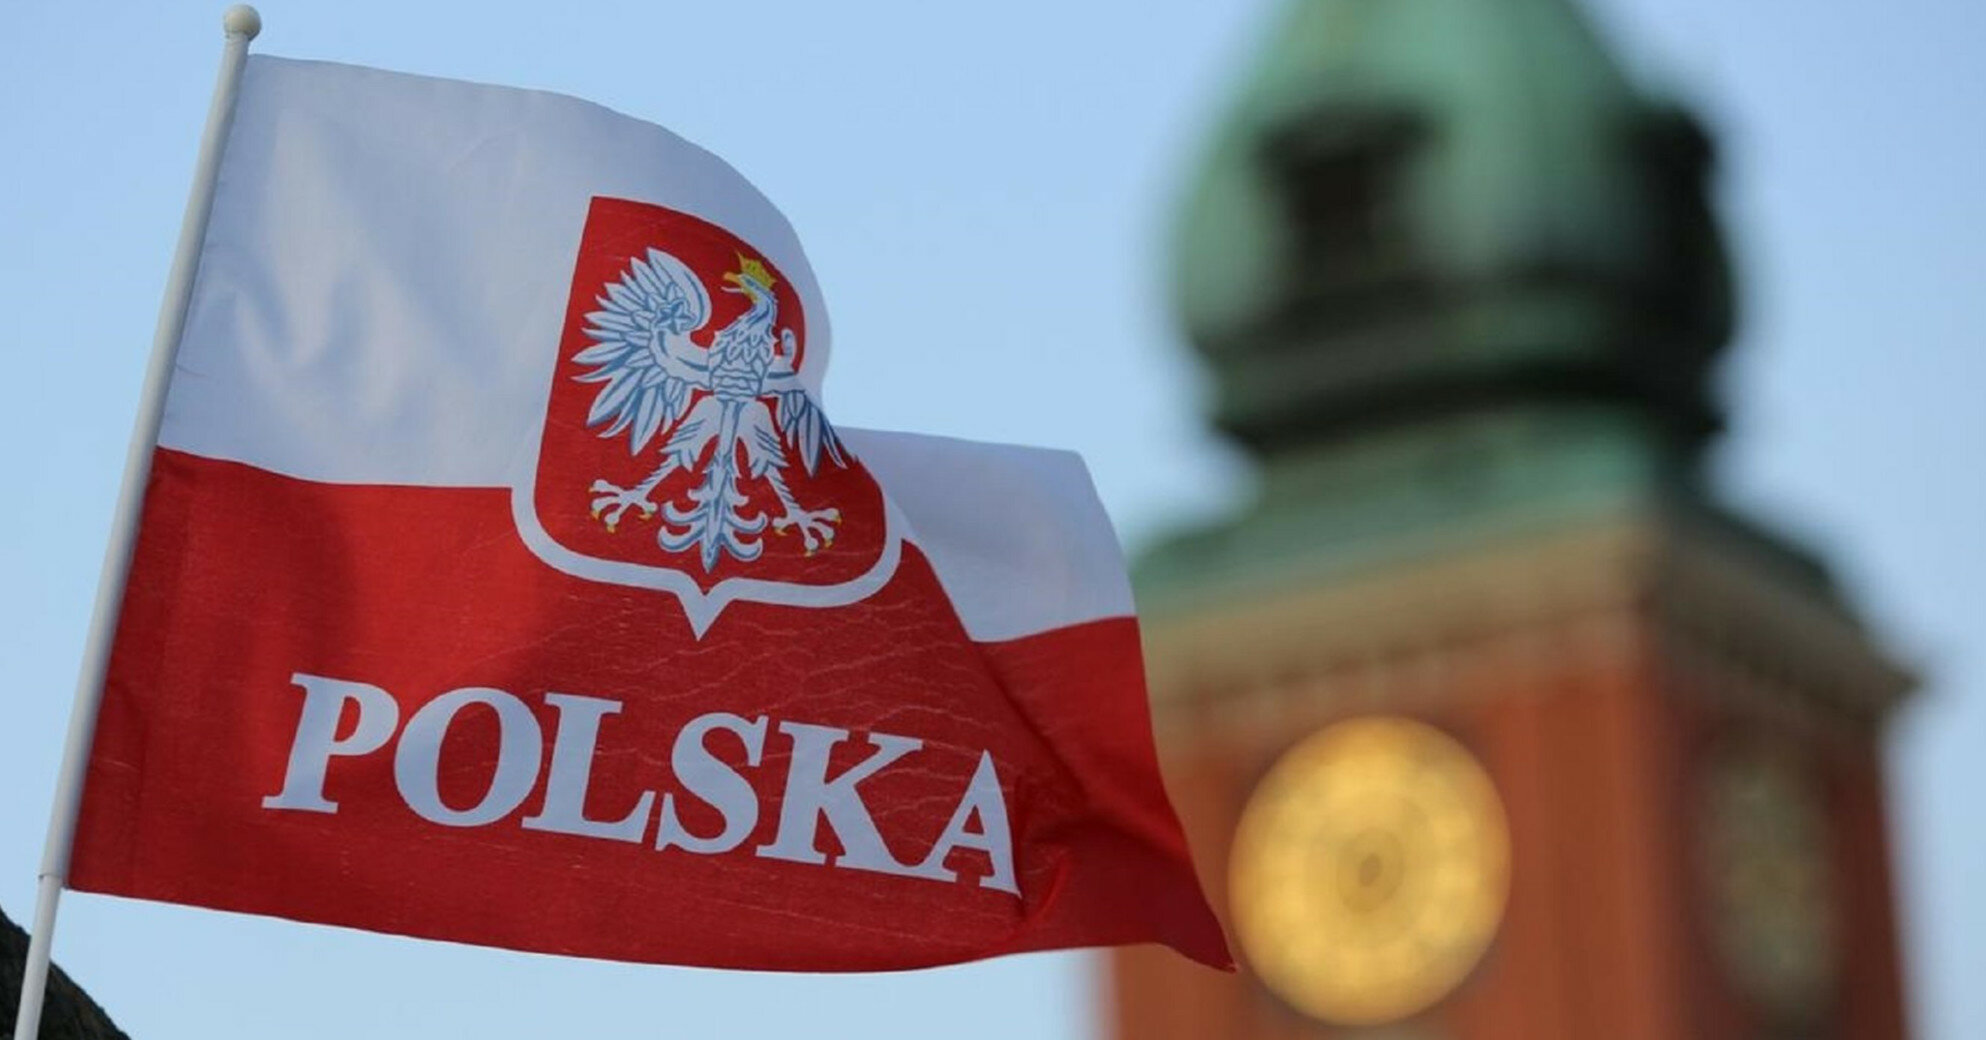 В Польше толпа посреди города напала на украинца